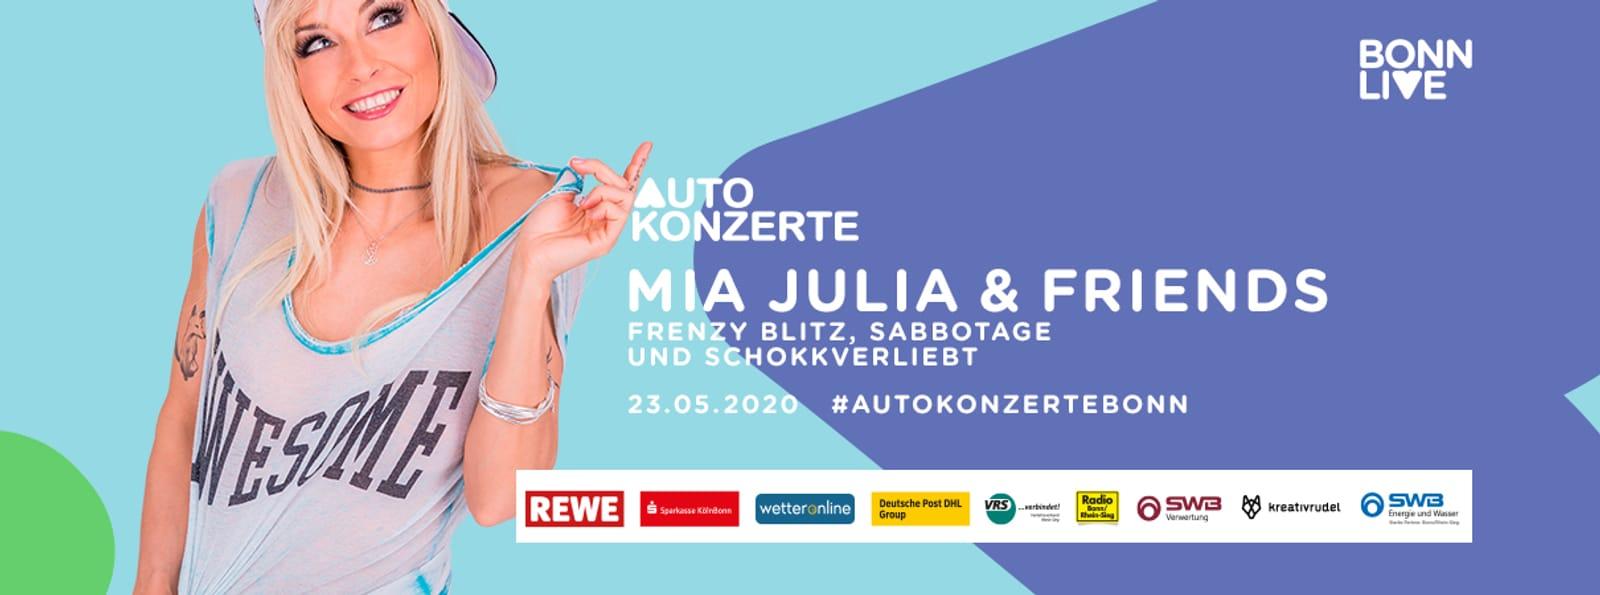 Mia Julia & Friends | BonnLive Autokonzerte